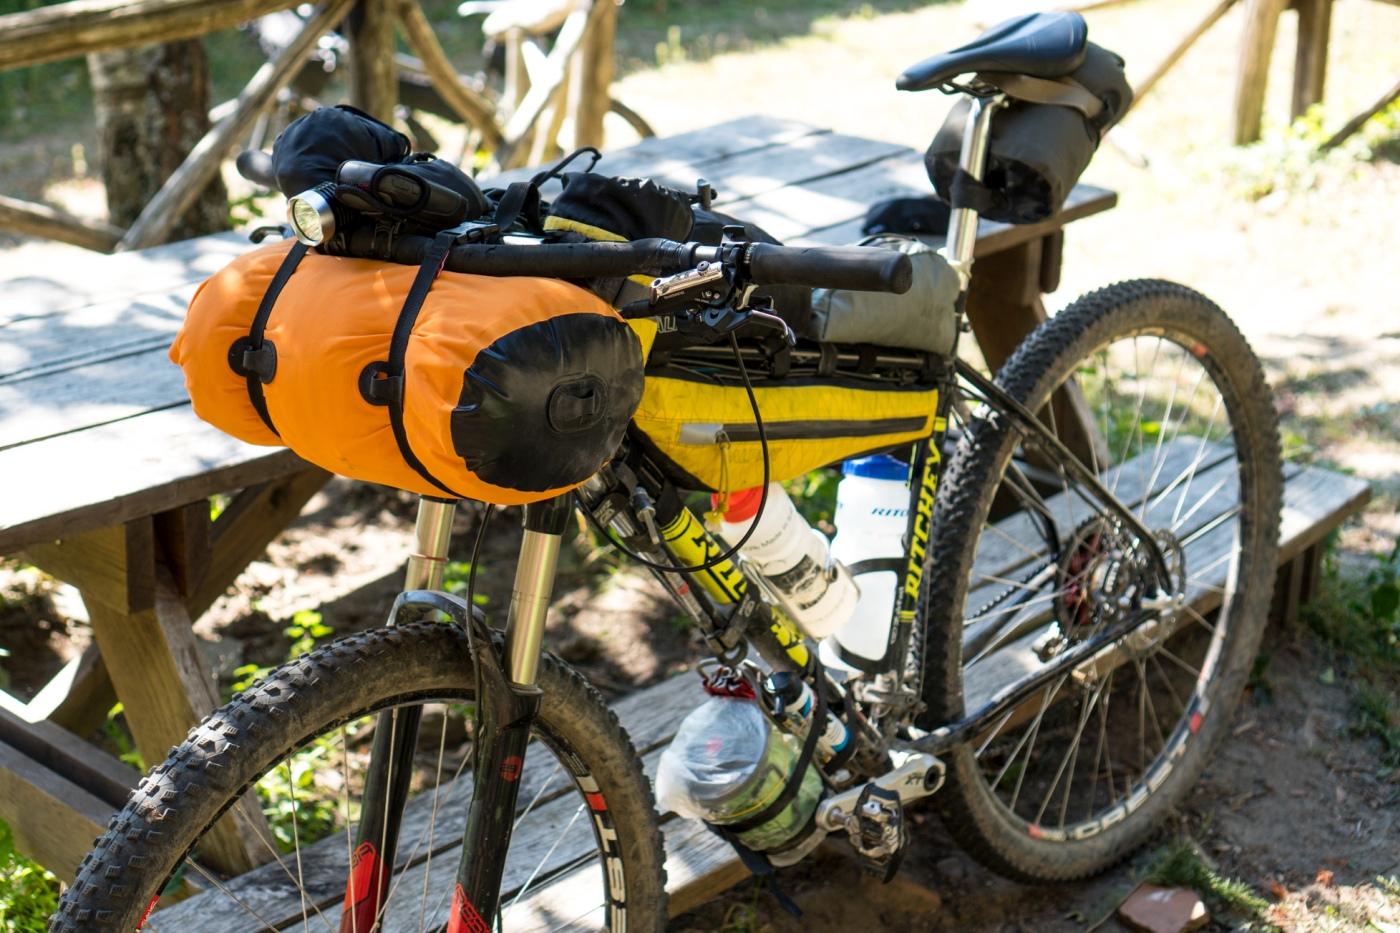 pratomagno_bikepacking-35